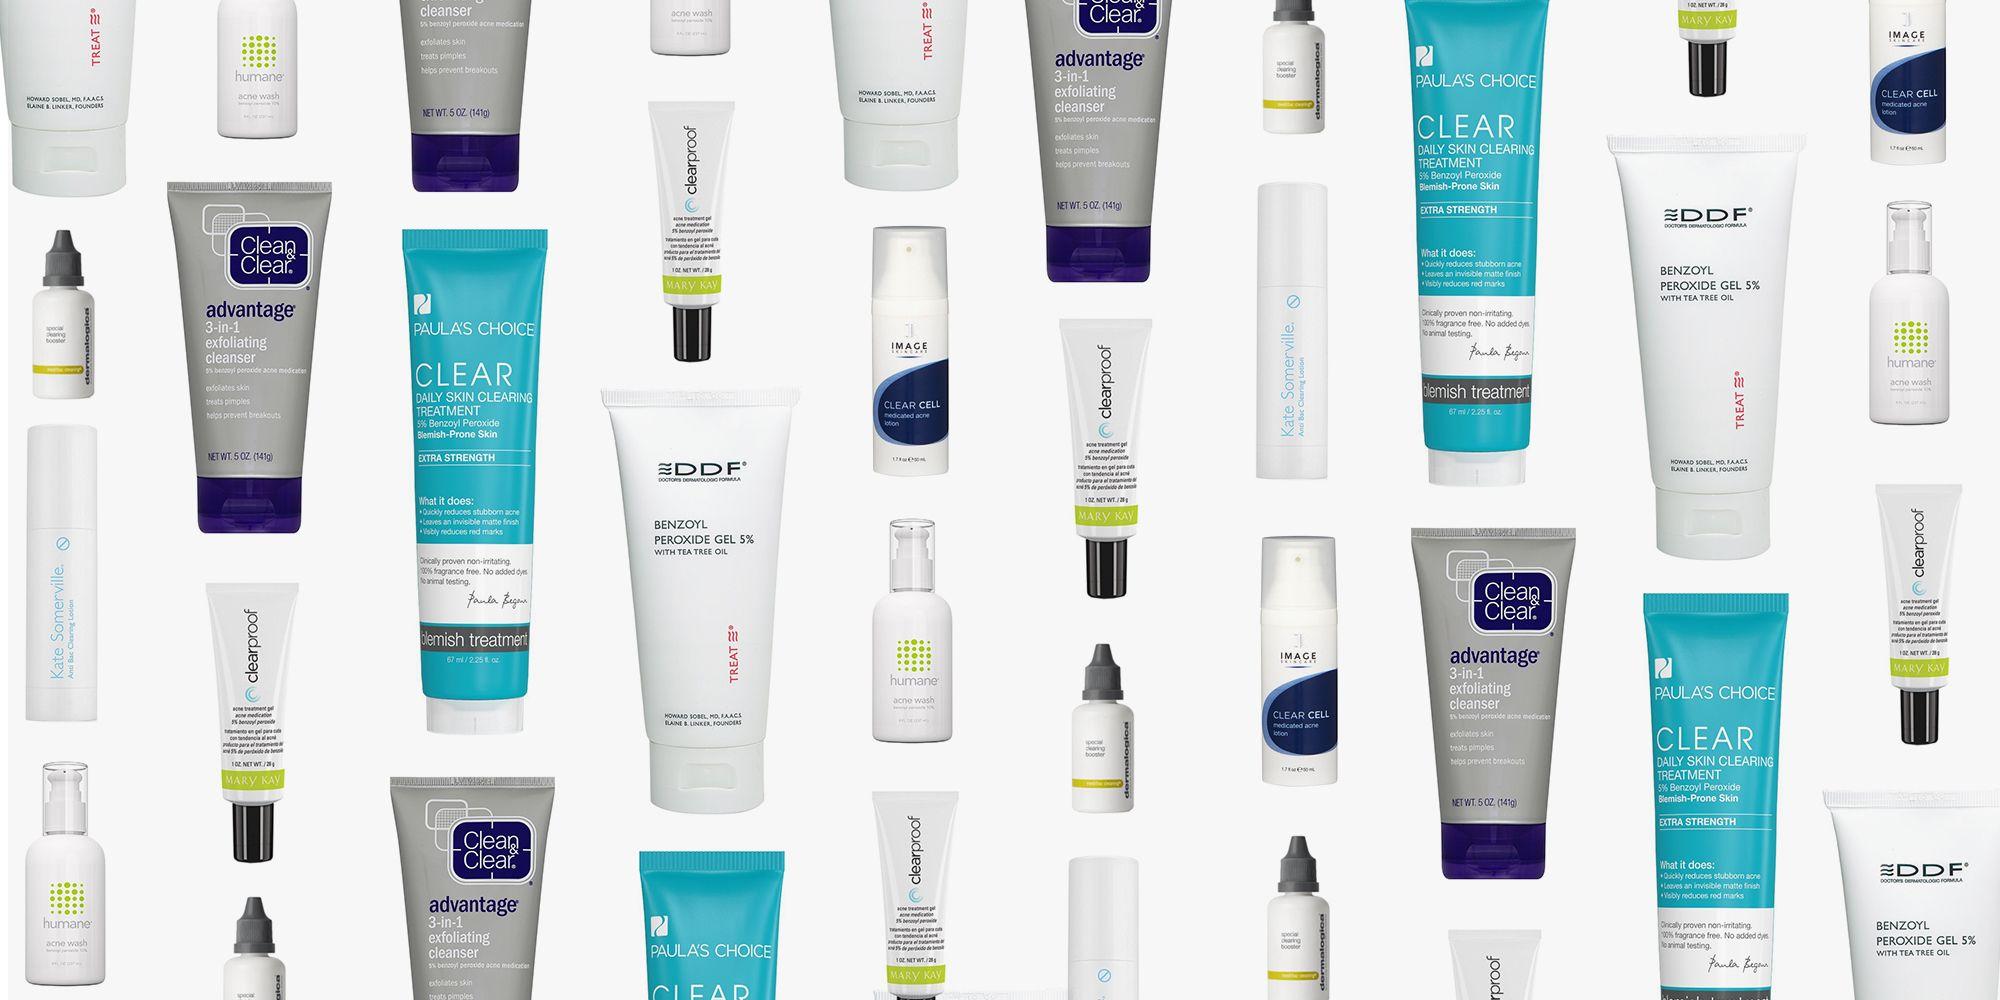 10 Best Benzoyl Peroxide Acne Treatments of 2018 Benzoyl Peroxide